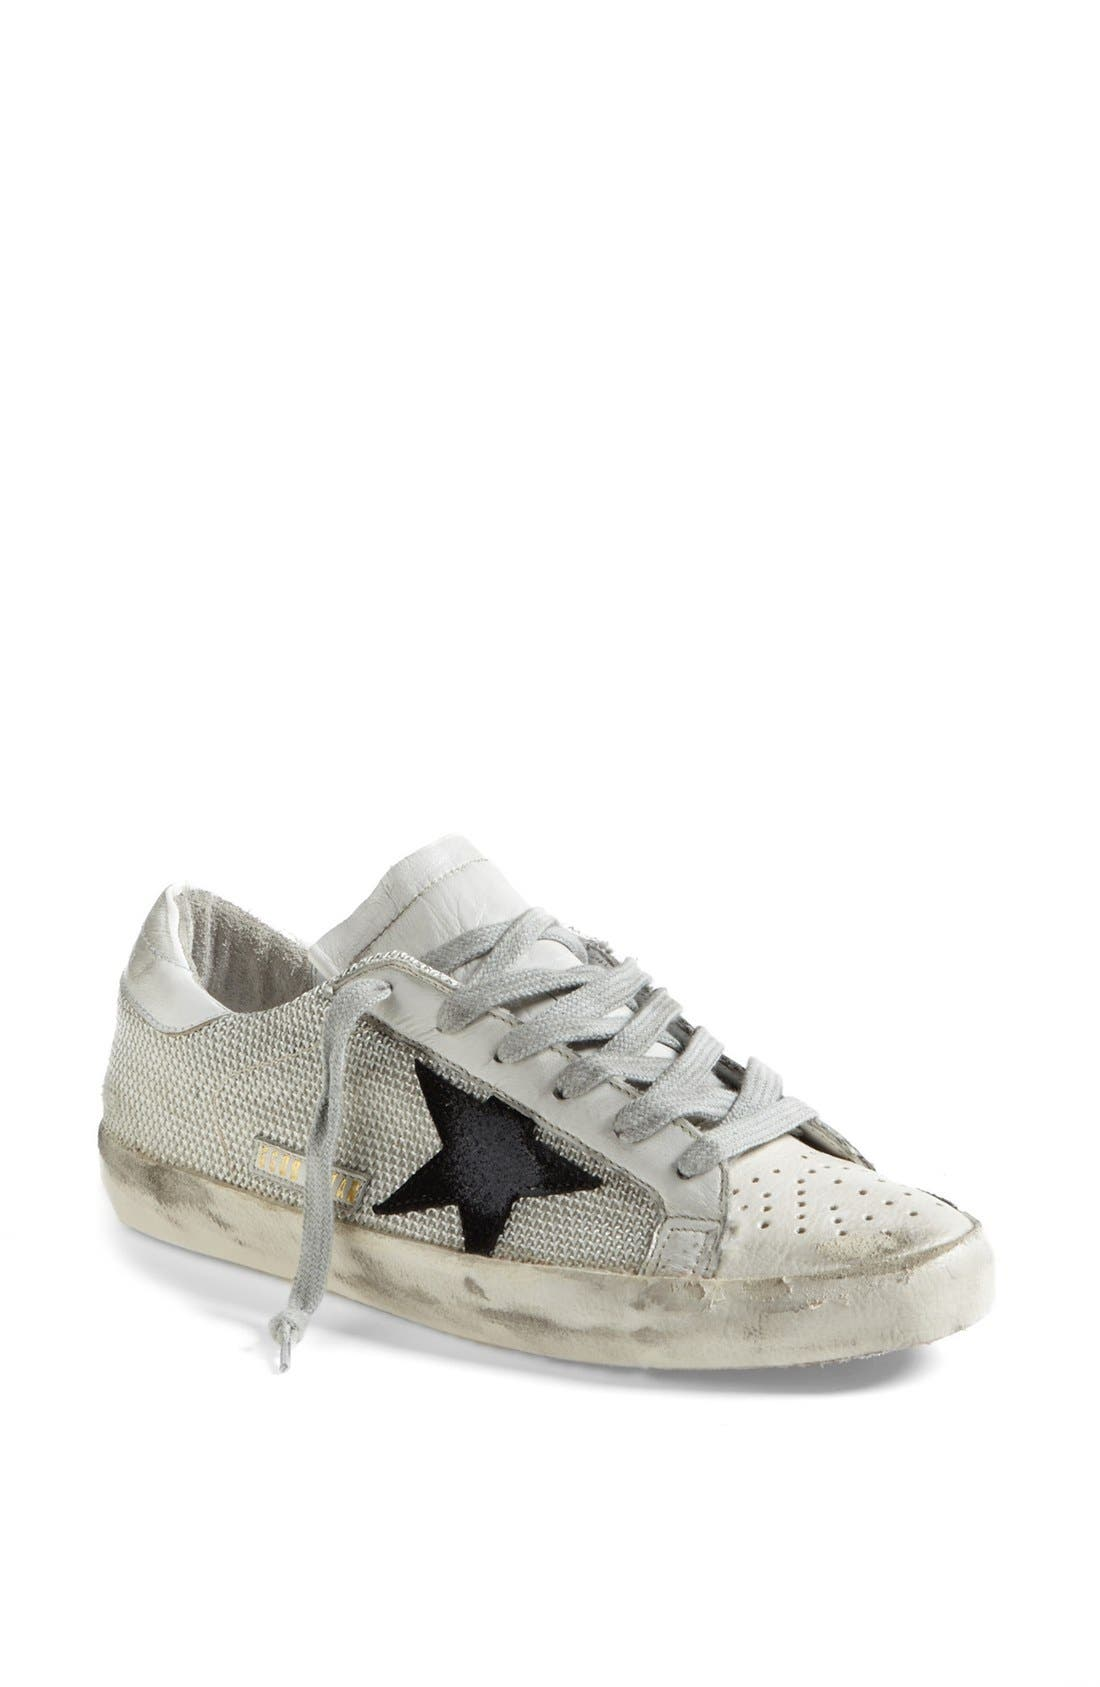 Alternate Image 1 Selected - Golden Goose 'Superstar' Sneaker